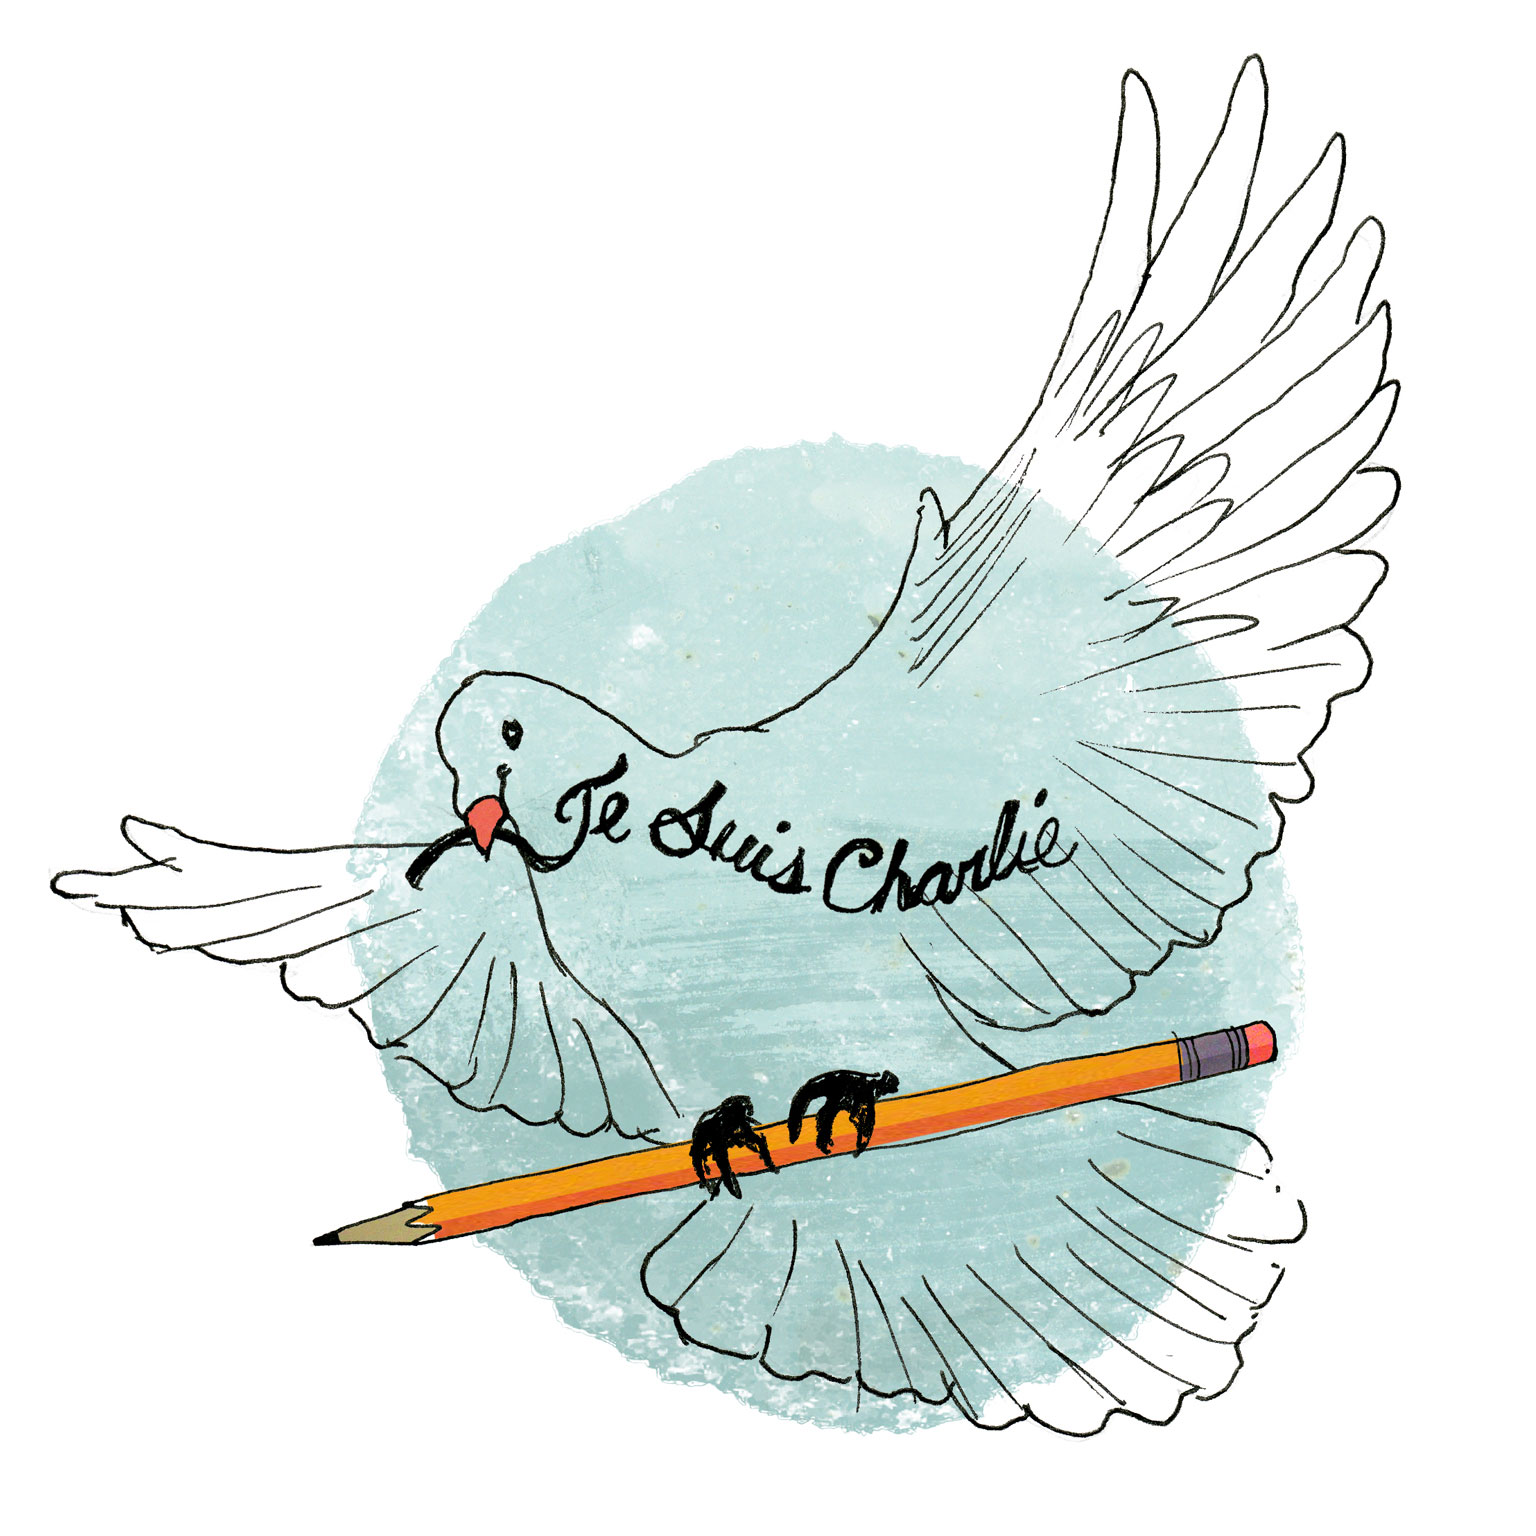 Illustration by Rachelle Maynard